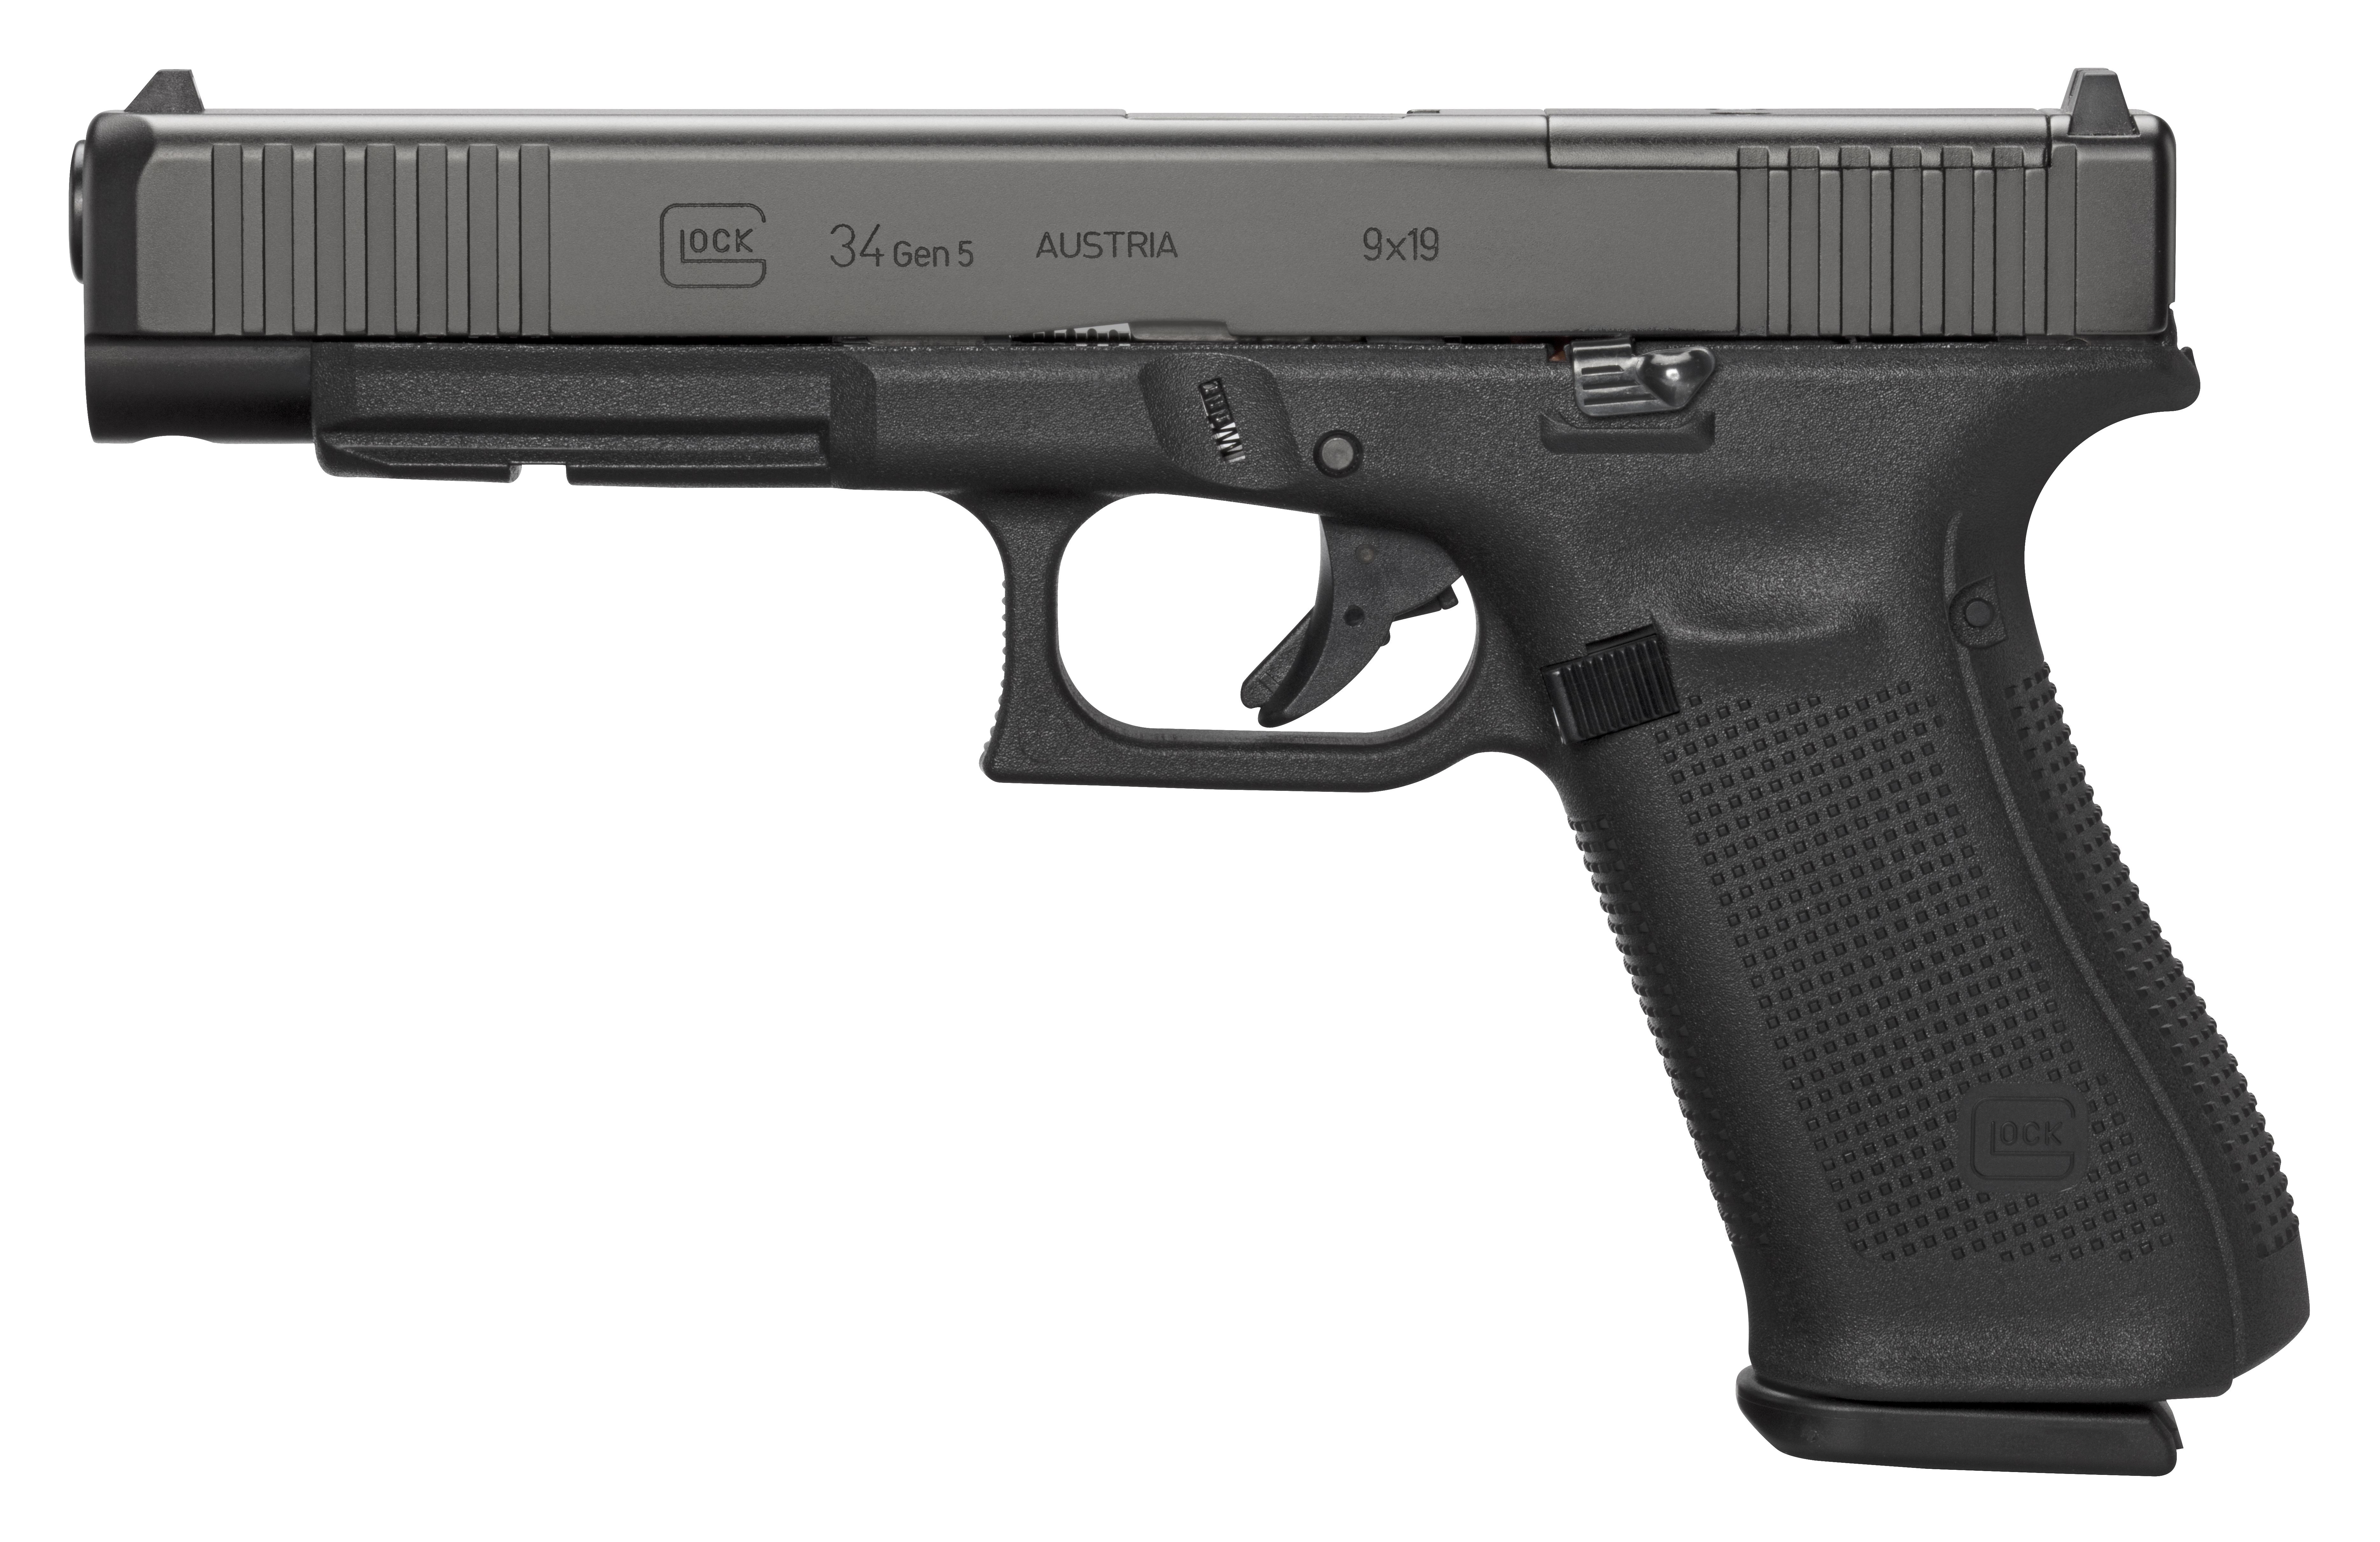 GLOCK G34 MOS G5 9mm